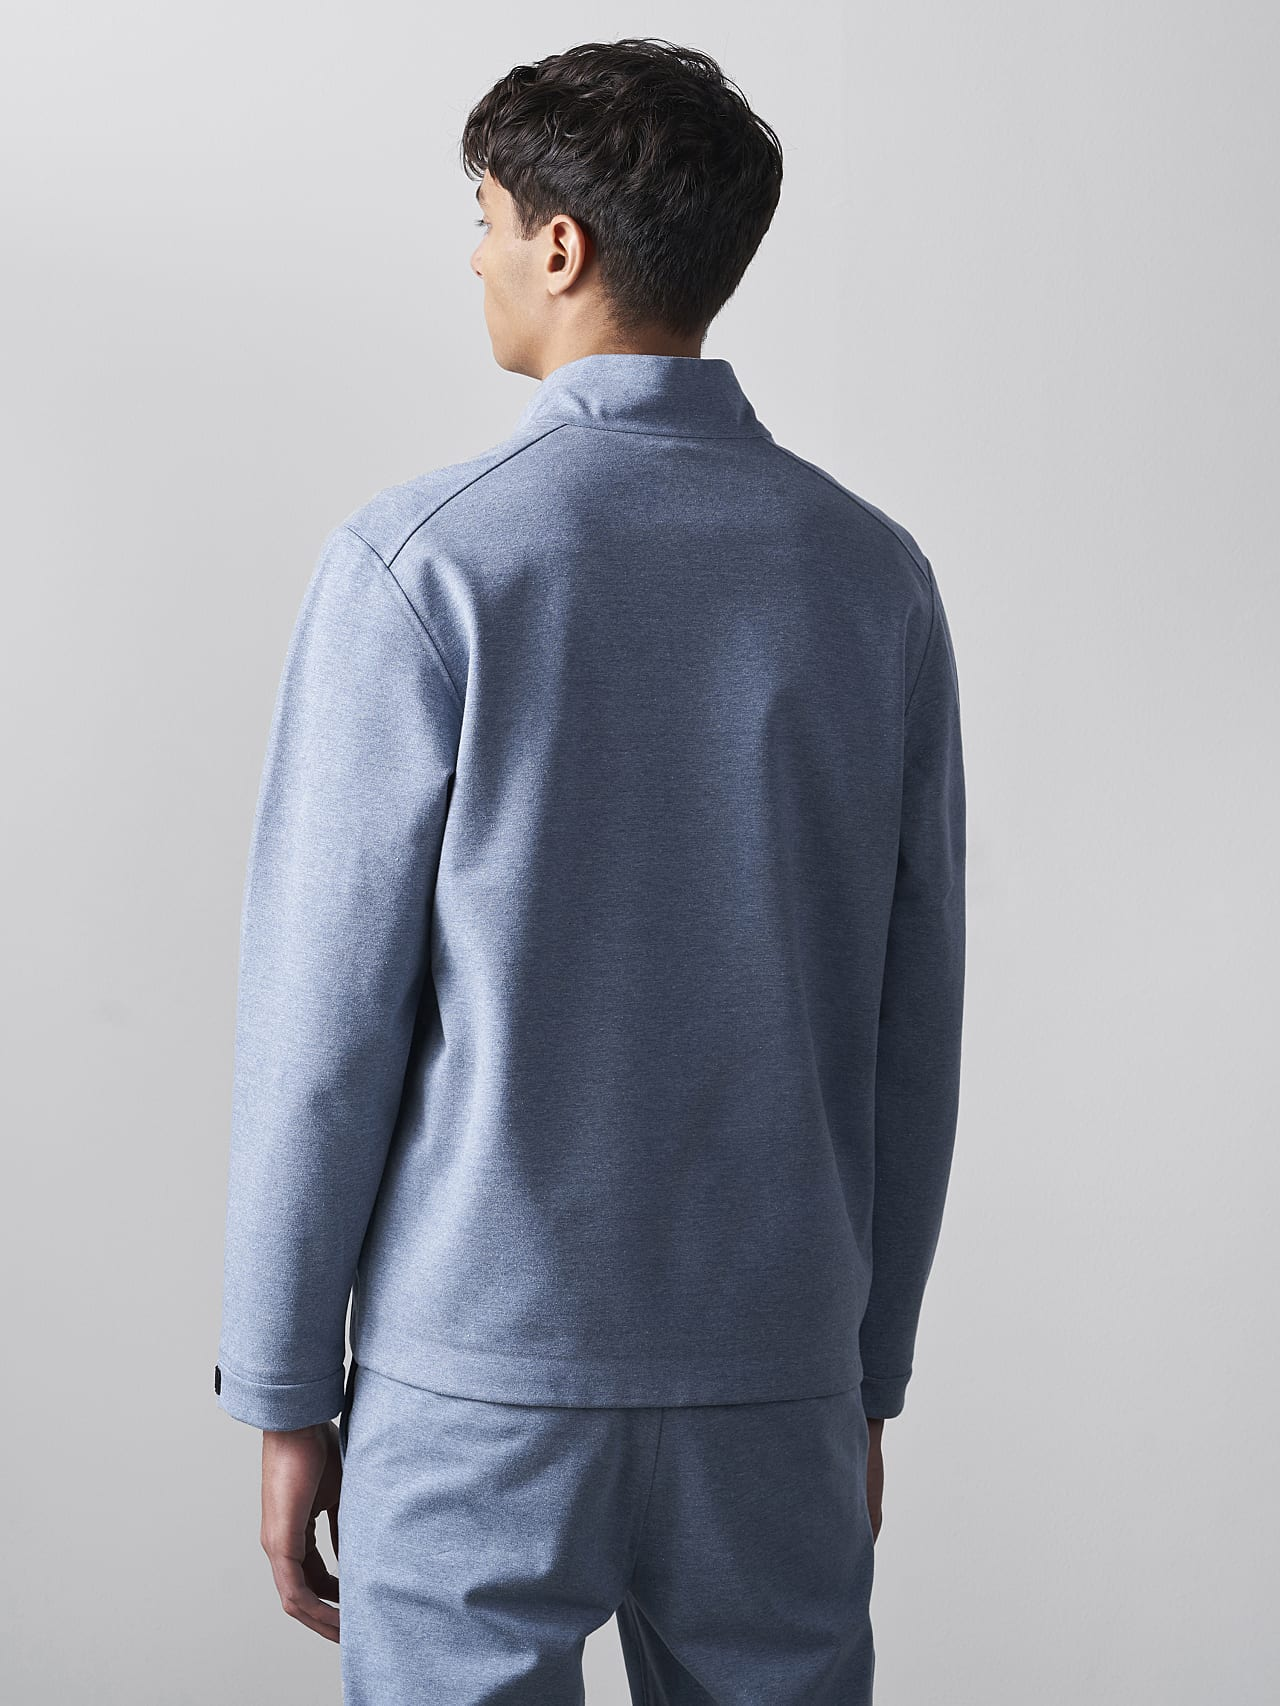 SROTO V1.Y5.02 Waterproof Half-Zip Sweatshirt medium blue Front Main Alpha Tauri